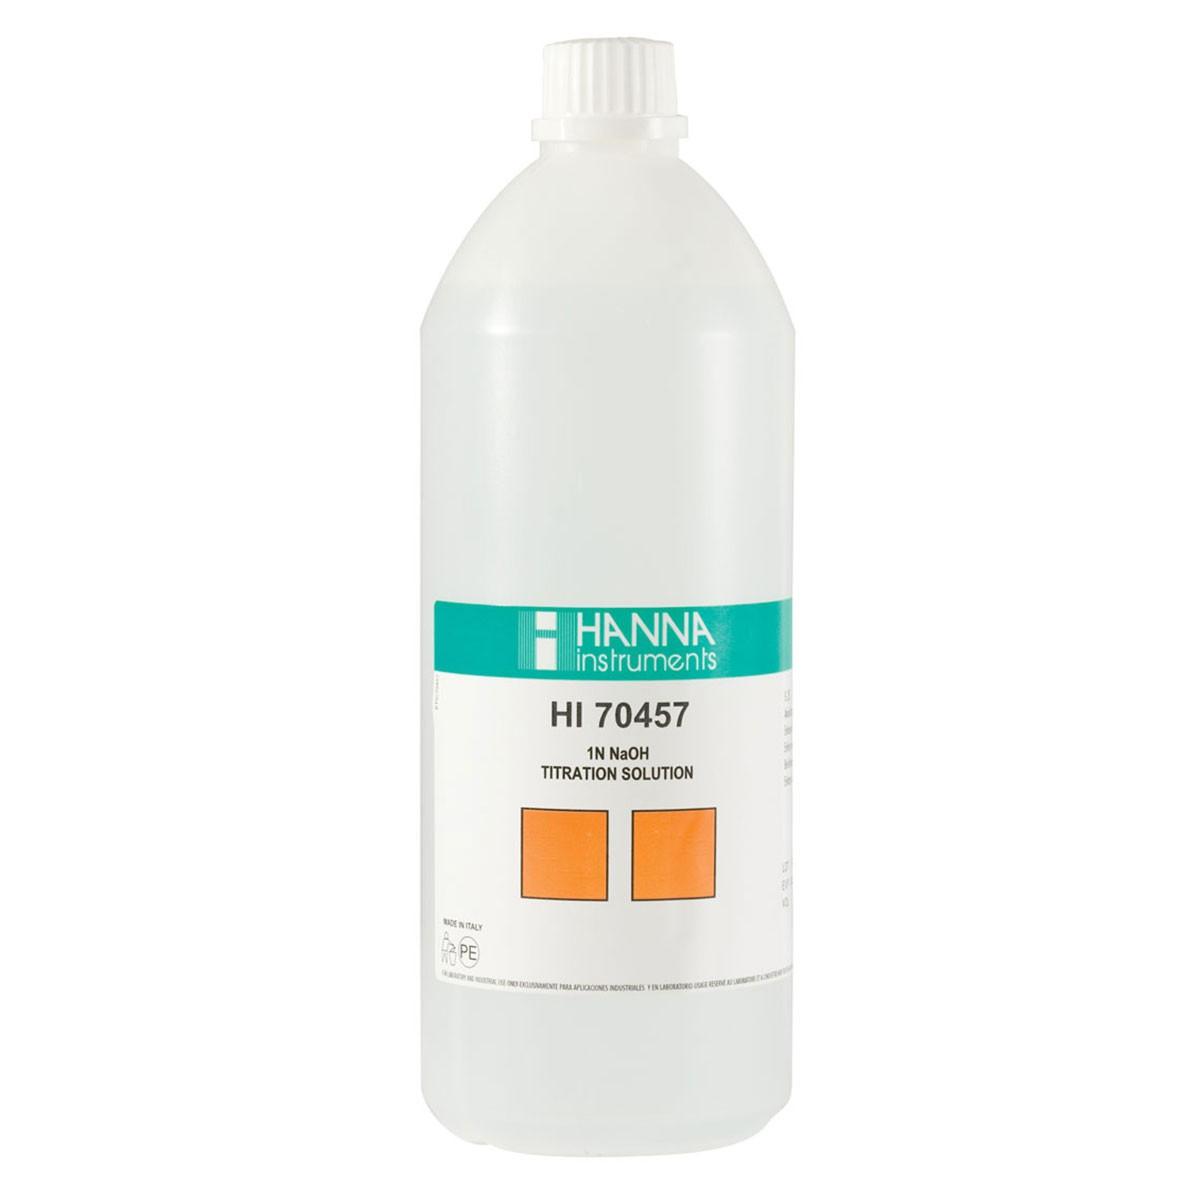 Sodium Hydroxide 1N, 1L - HI70457